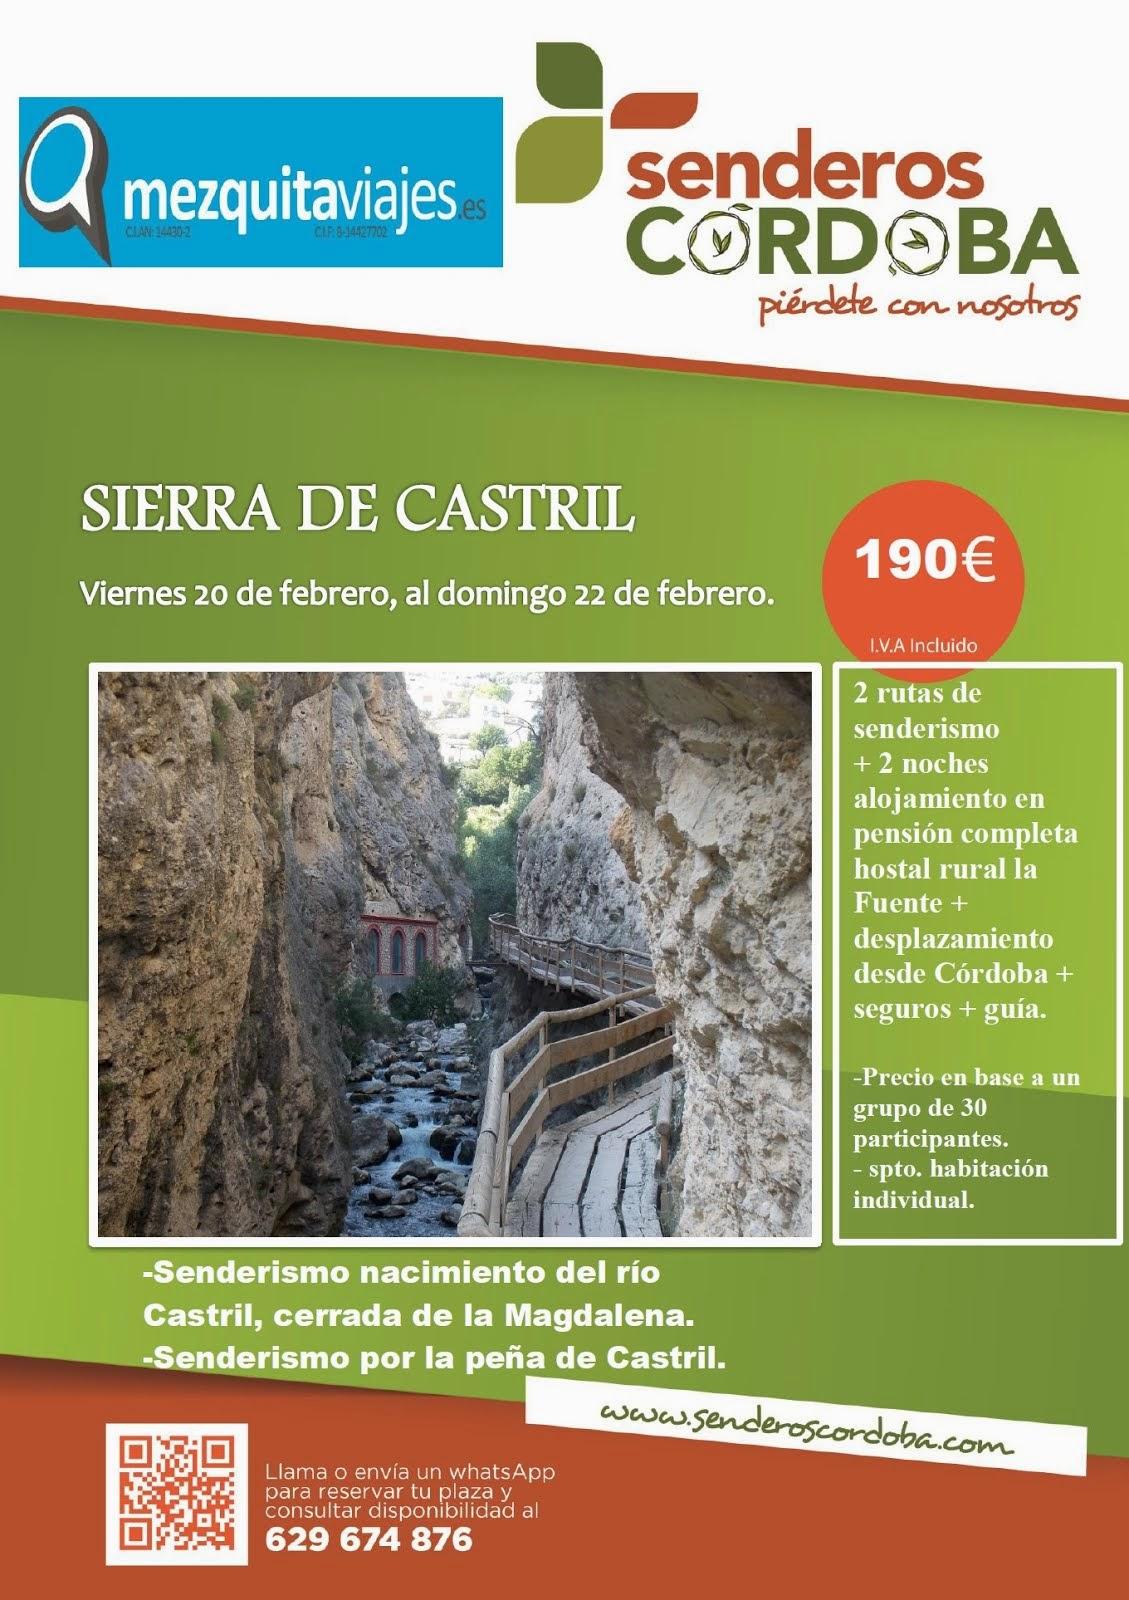 Fin de semana en la Sierra de Castril